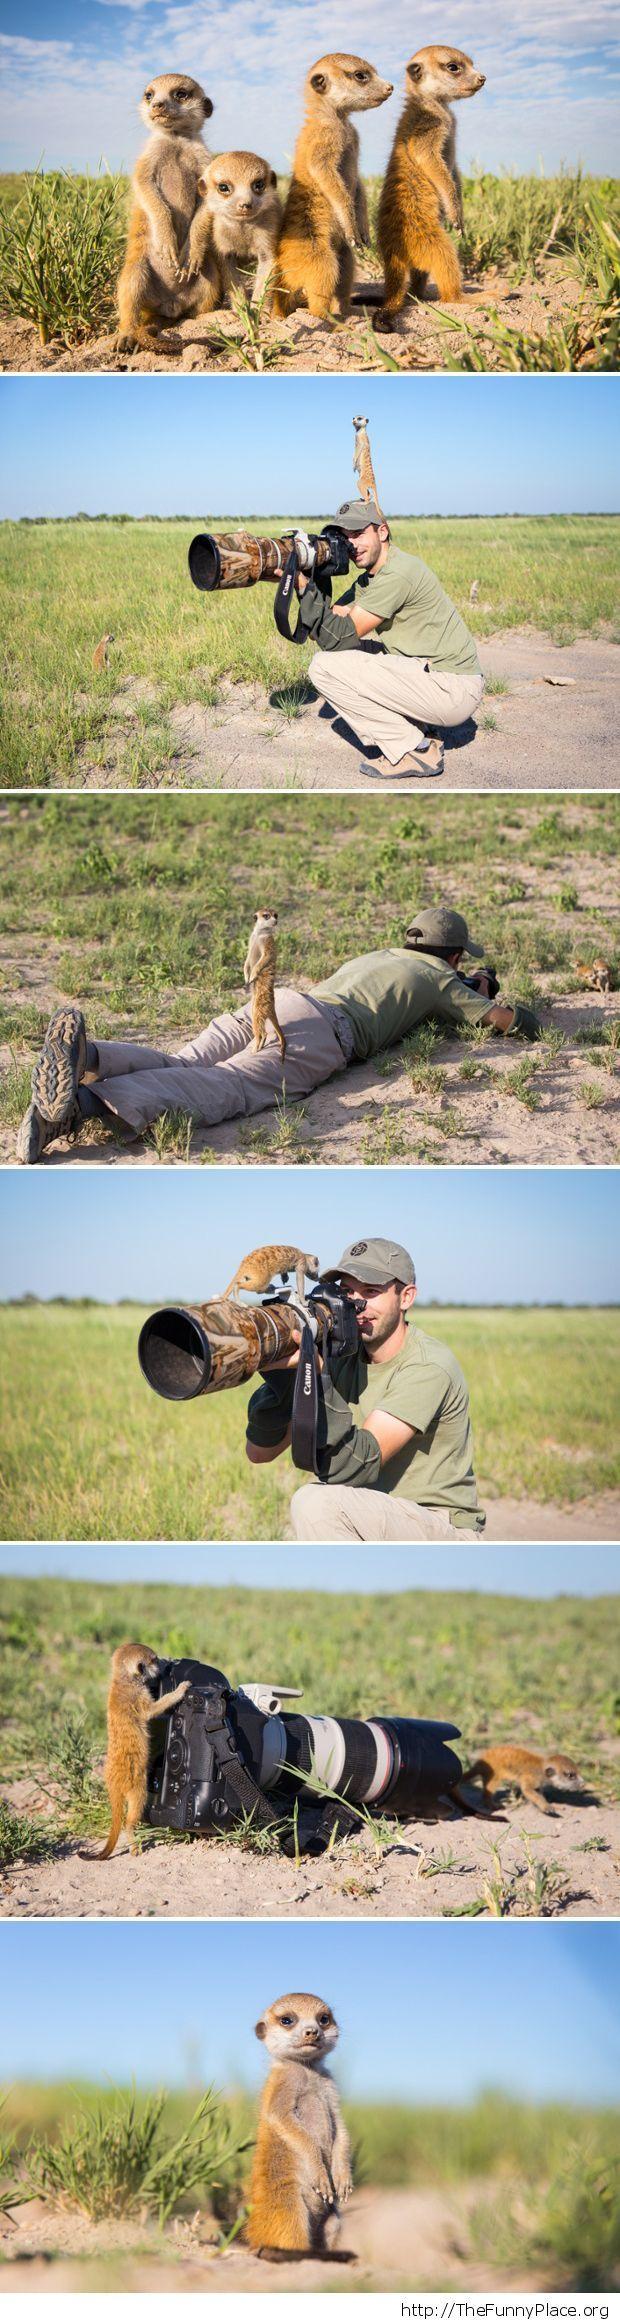 Baby meerkats playing with photographer in Botswana